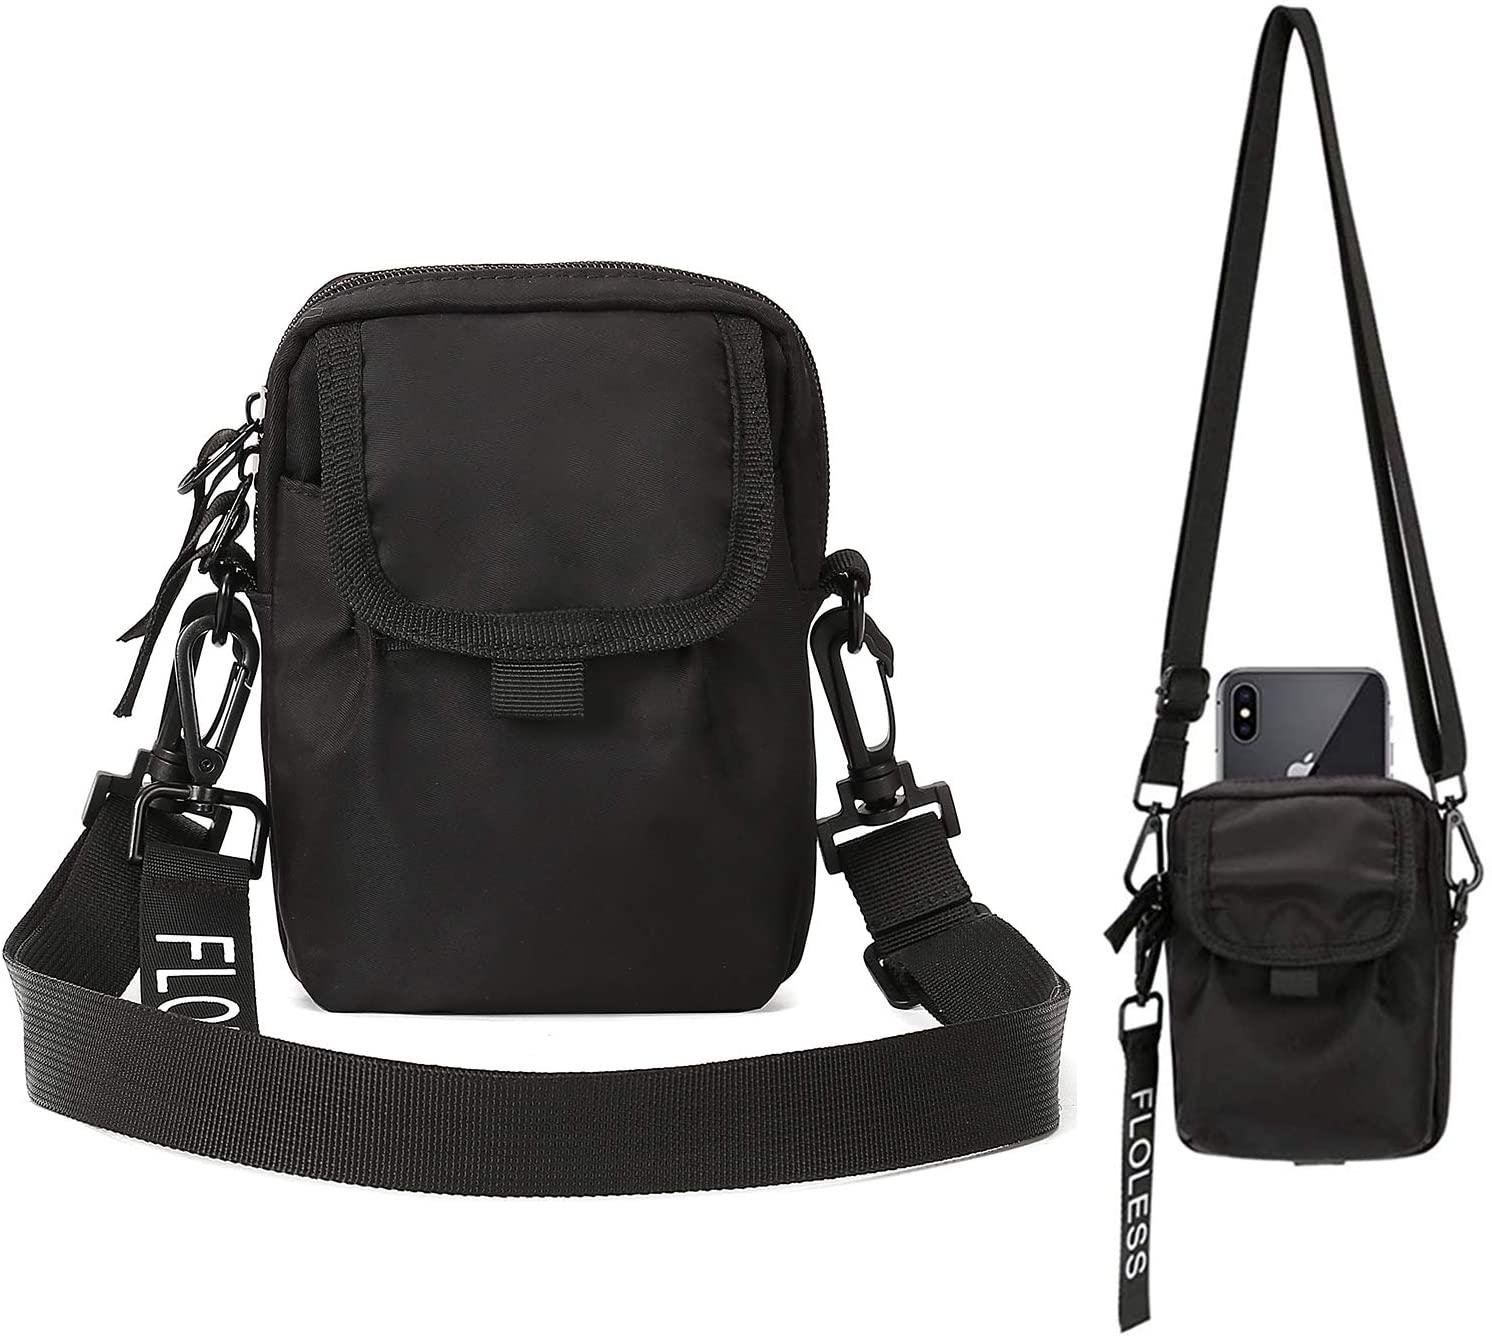 Small Black Crossbody Shoulder Side Bag for Men Women Mini Satchel Bag Messenger Bag Travel Passport Bag,Tactical Pouch Waist Bag Belt Bag Purse for Men Women Cell Phone Pouch Purse Neck Wallet